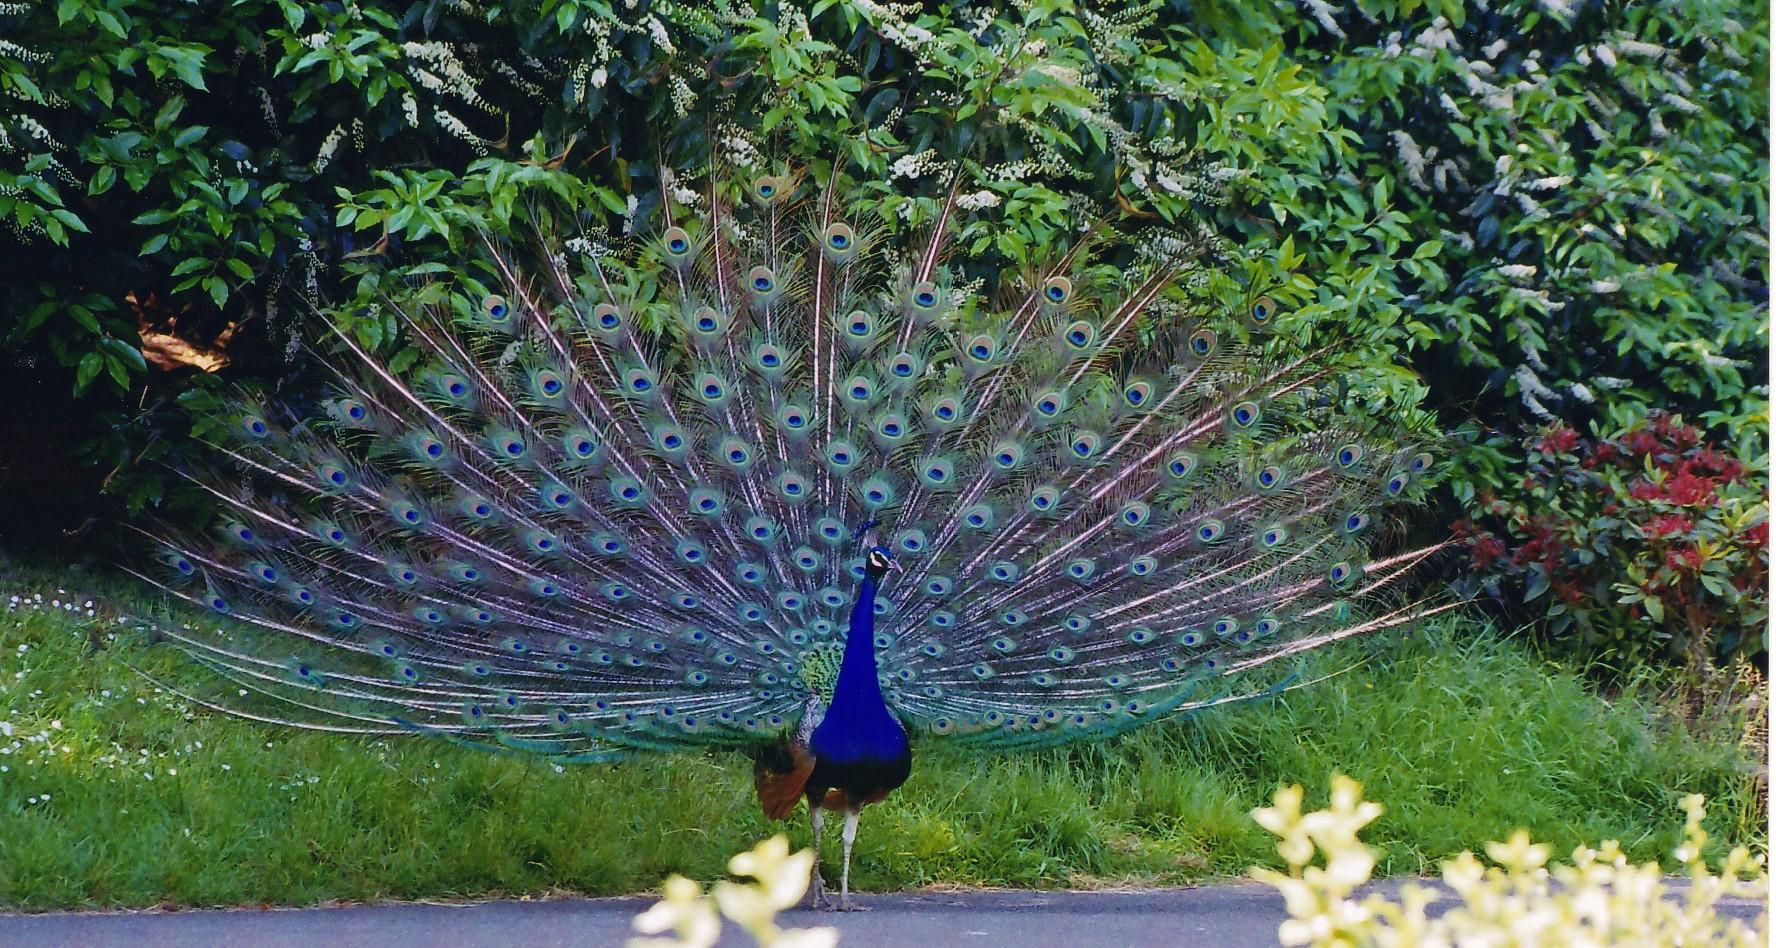 Bankapura Peacock Sanctuary - Wikipedia